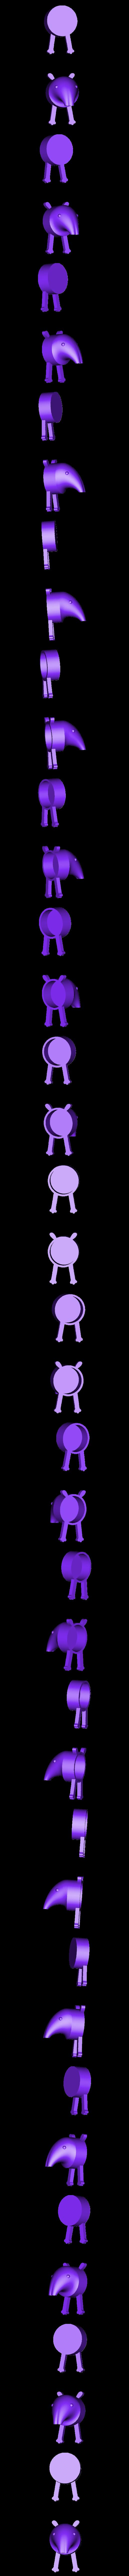 corkpals-tapir.stl Download free STL file Cork Pals: Tapir-Rex (T-Rex) • 3D printer design, UAUproject